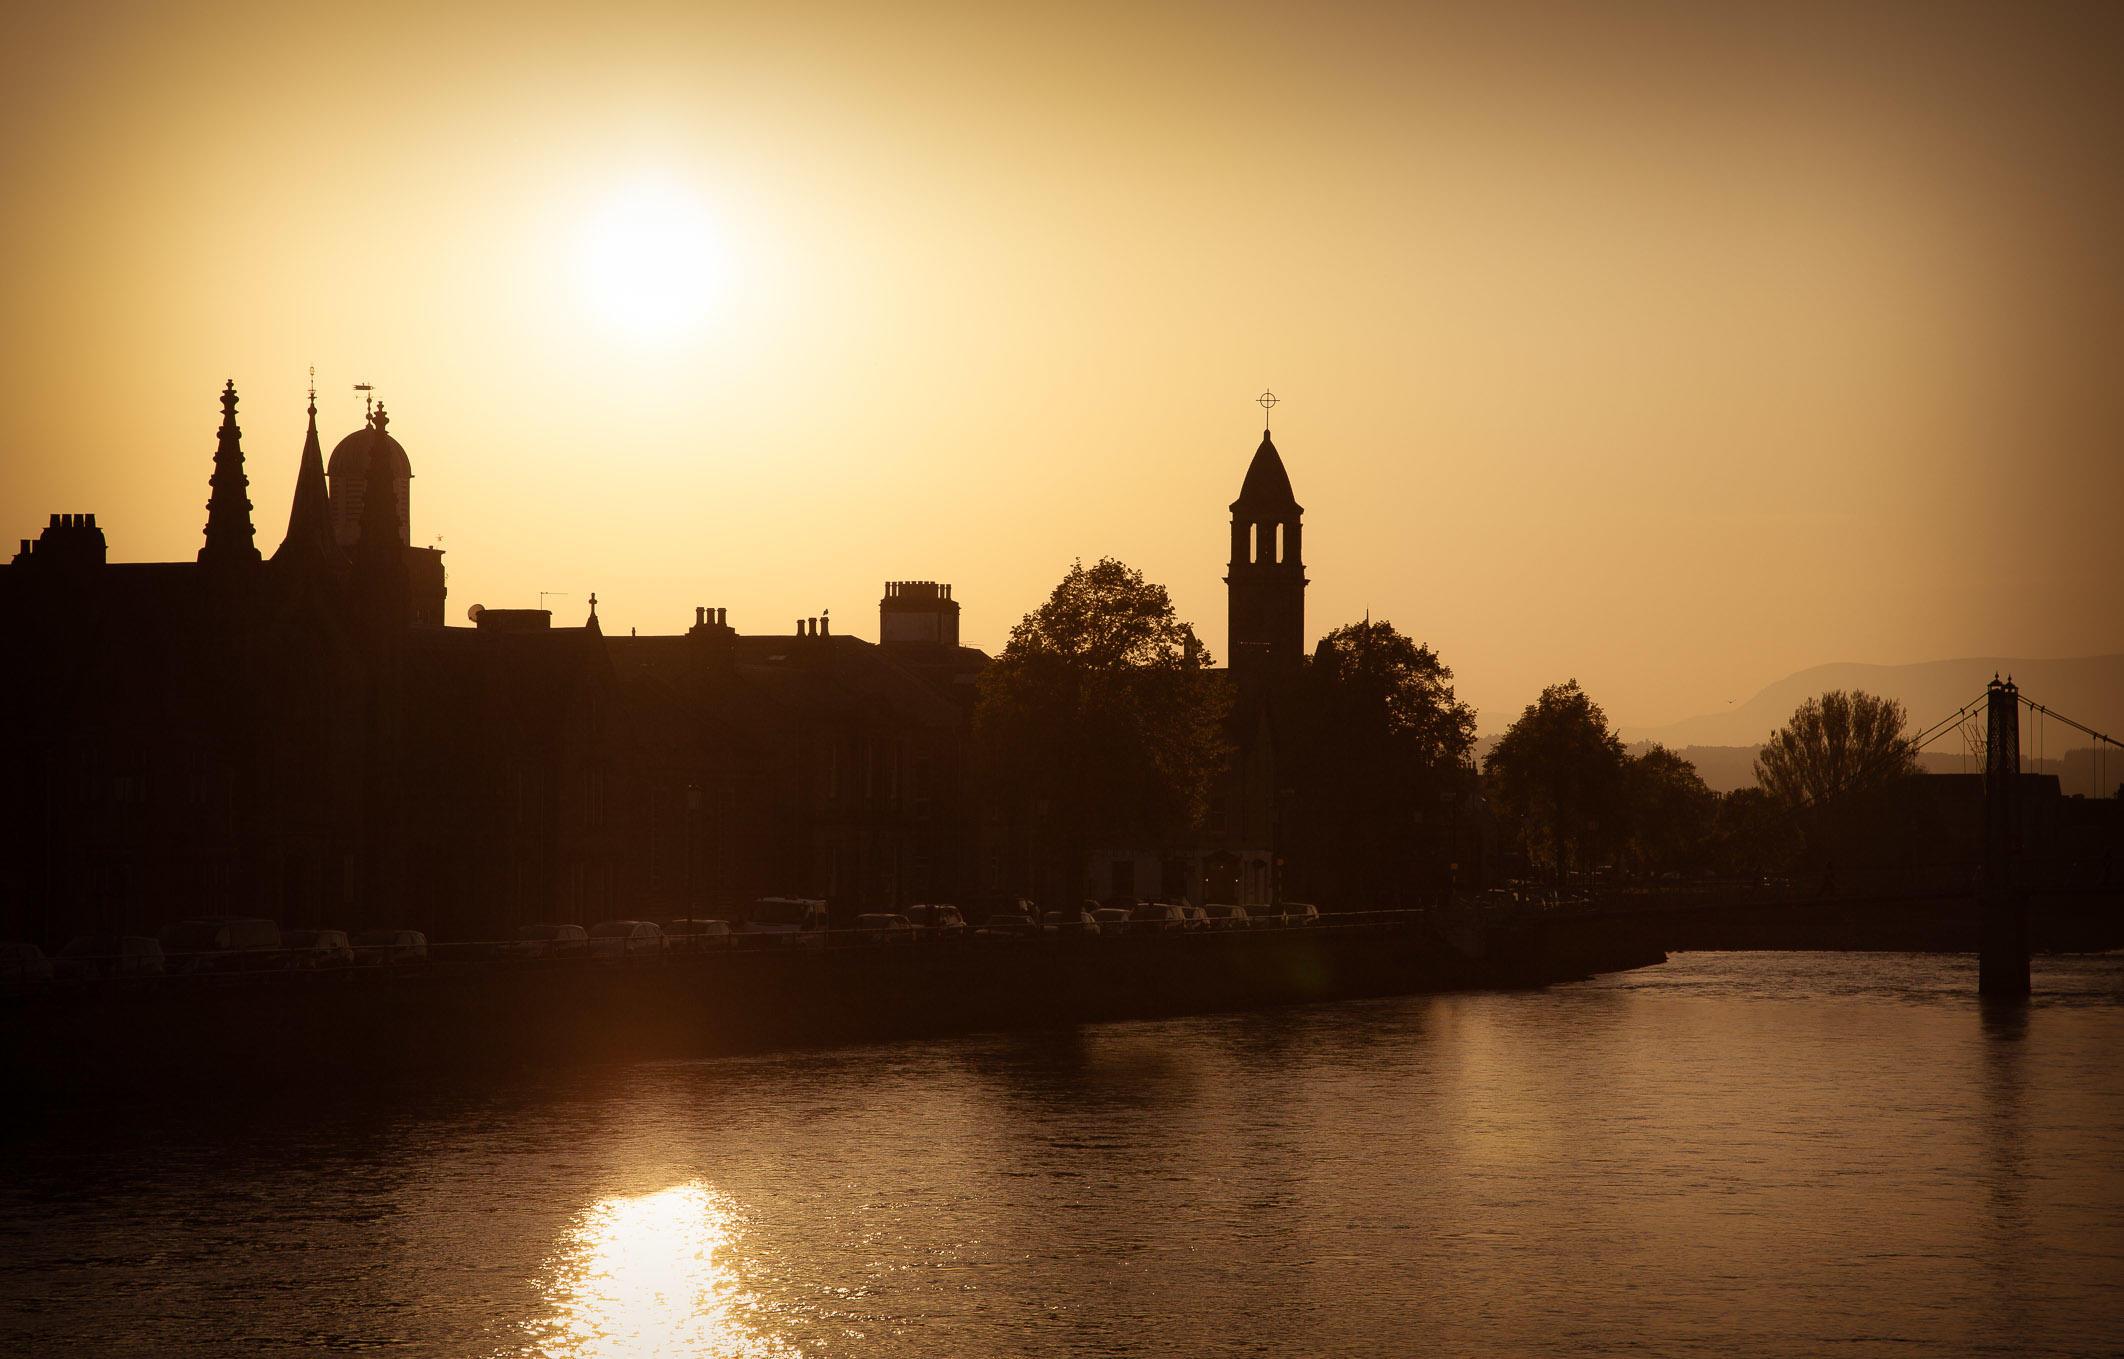 Sunset, Inverness, Scotland.